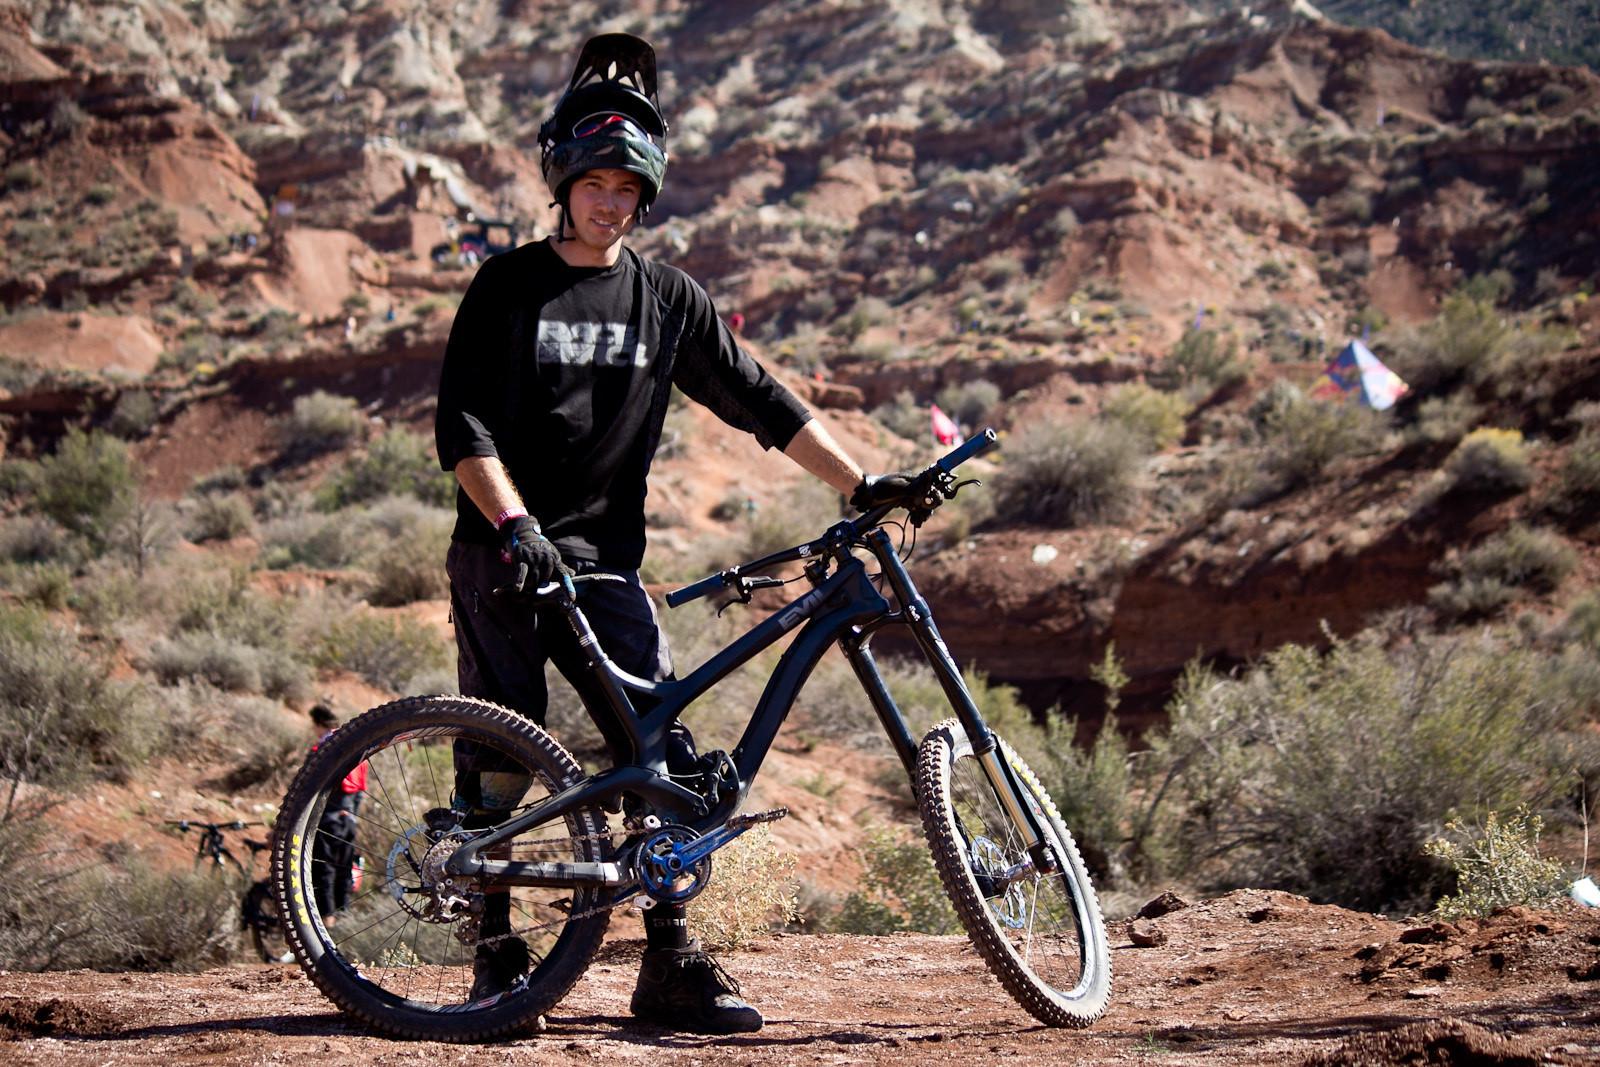 Rampage Pro Bike: Mike Kinrade's Evil Undead - Rampage Pro Bike: Mike Kinrade's Evil Undead - Mountain Biking Pictures - Vital MTB